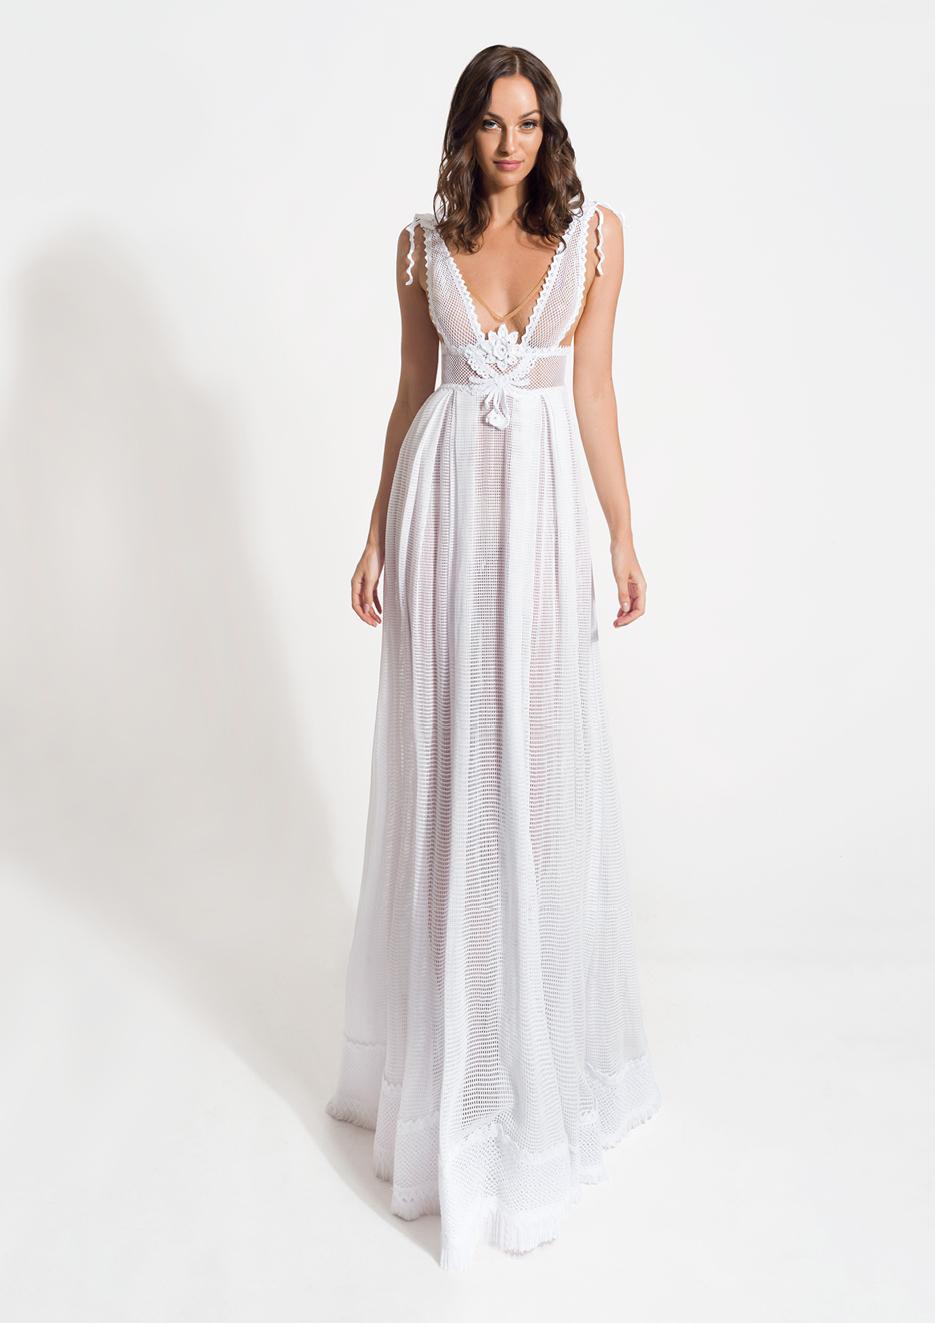 Atelier Zolotas wedding dresses | Hellenic Vintage Origin